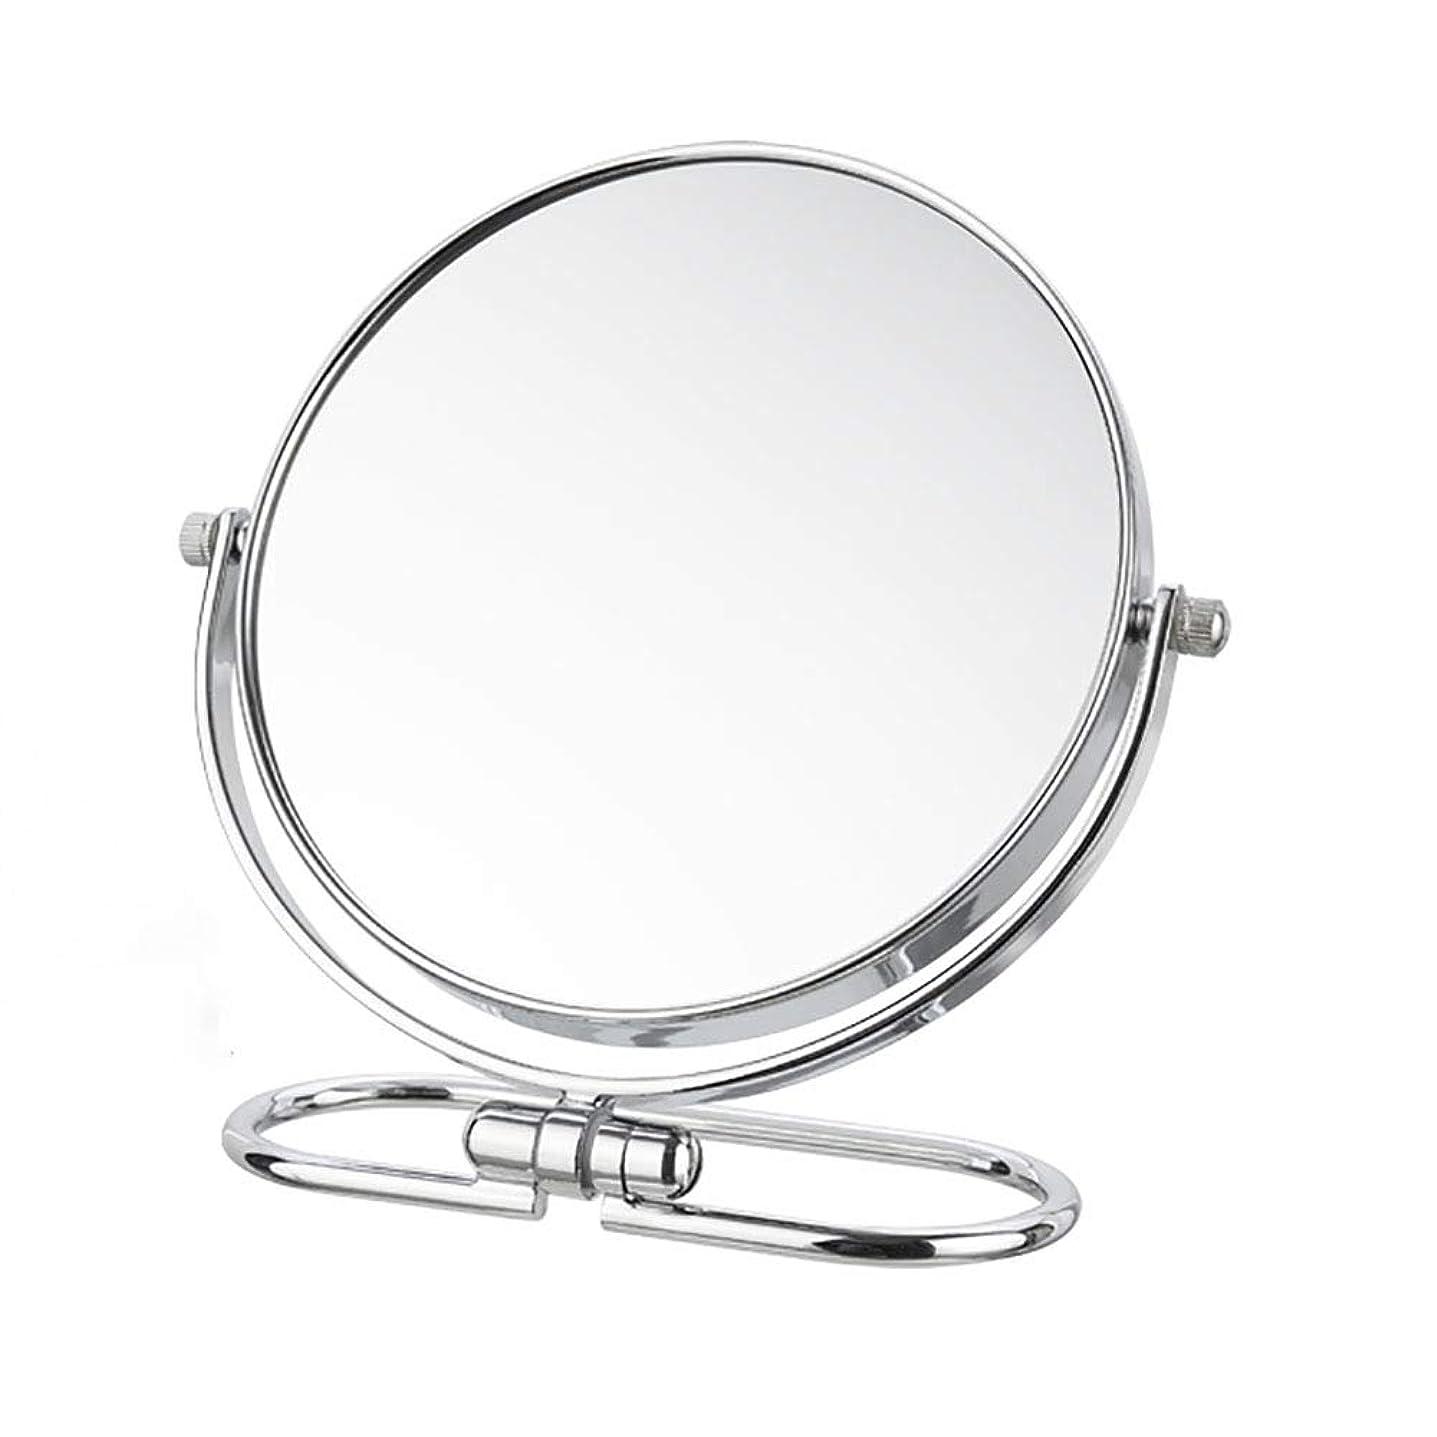 炎上月曜日浸す化粧鏡拡大両面鏡自立型ポータブル化粧台鏡